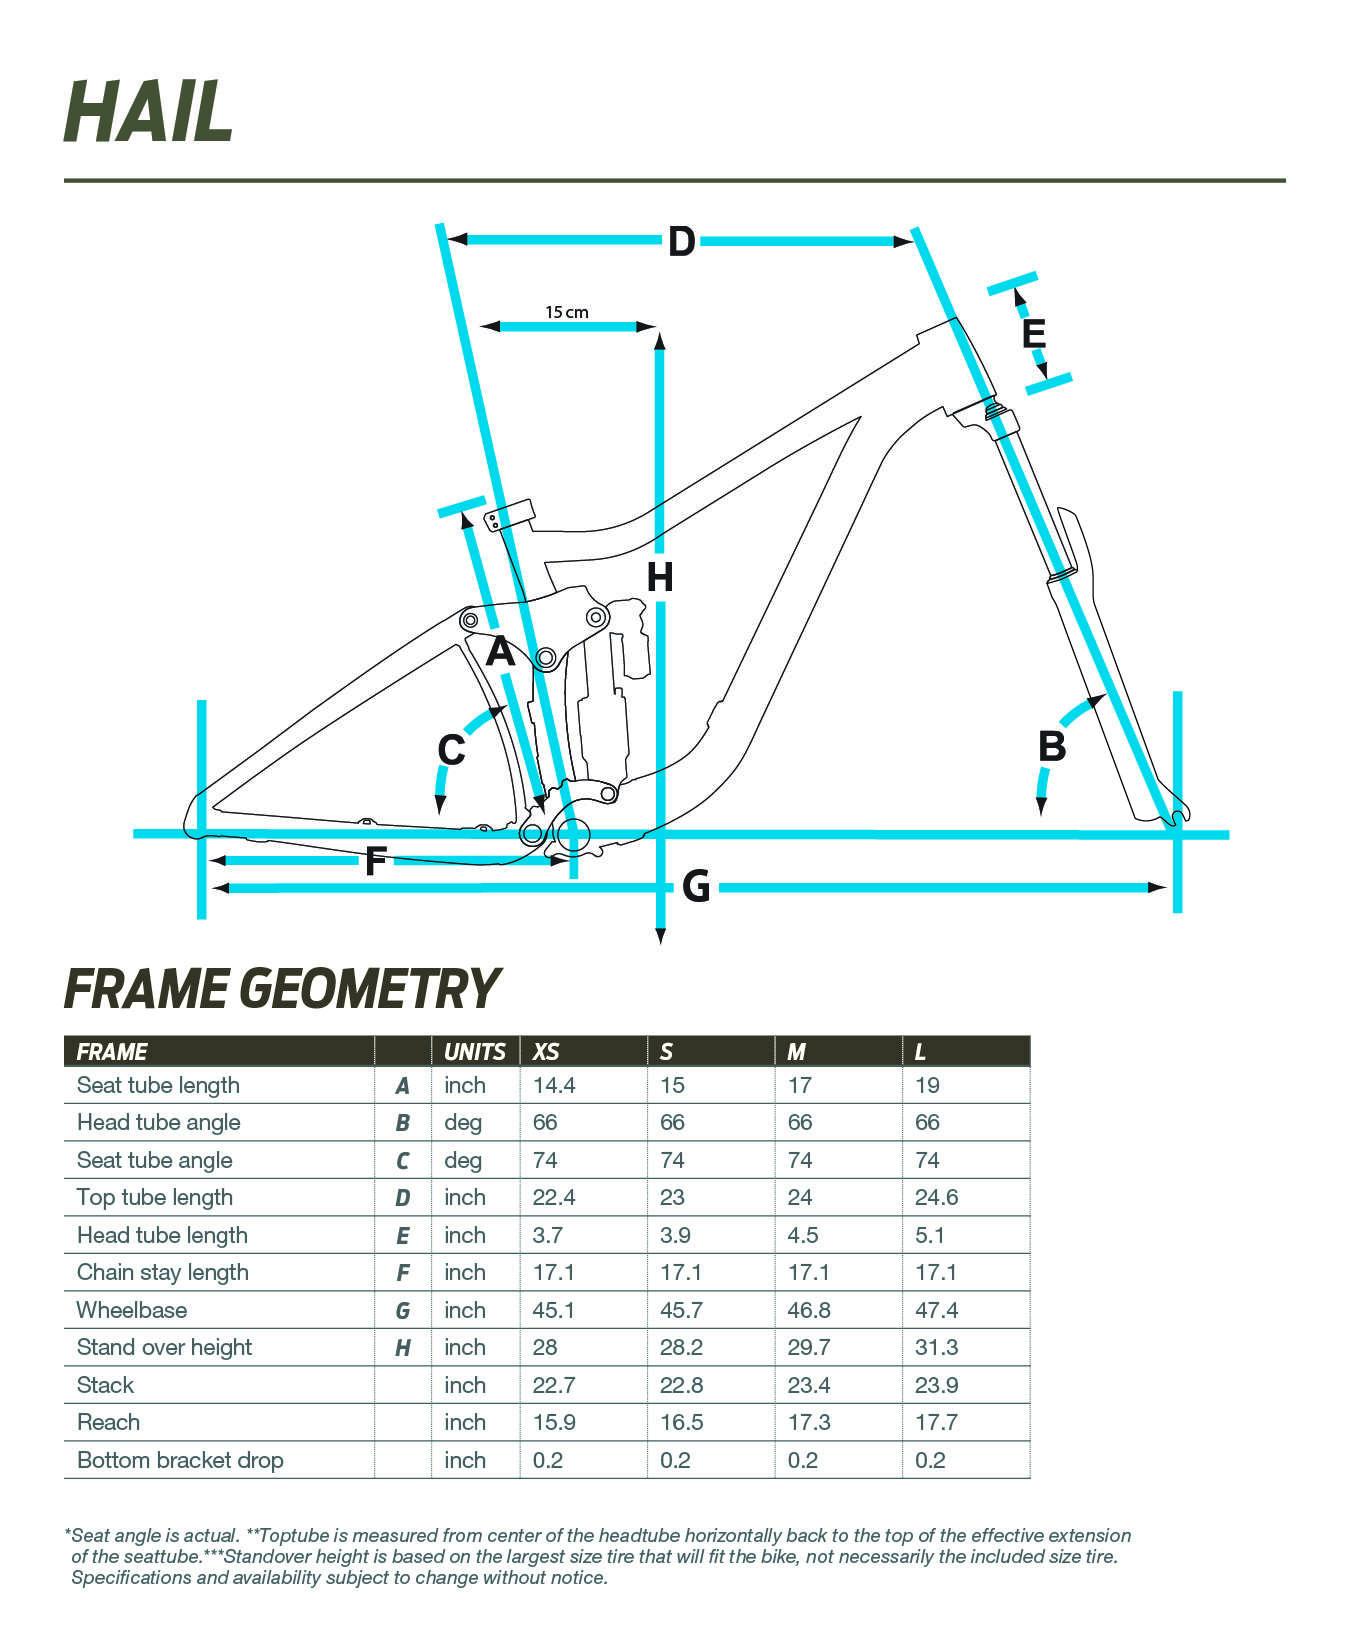 Liv Hail geometry chart